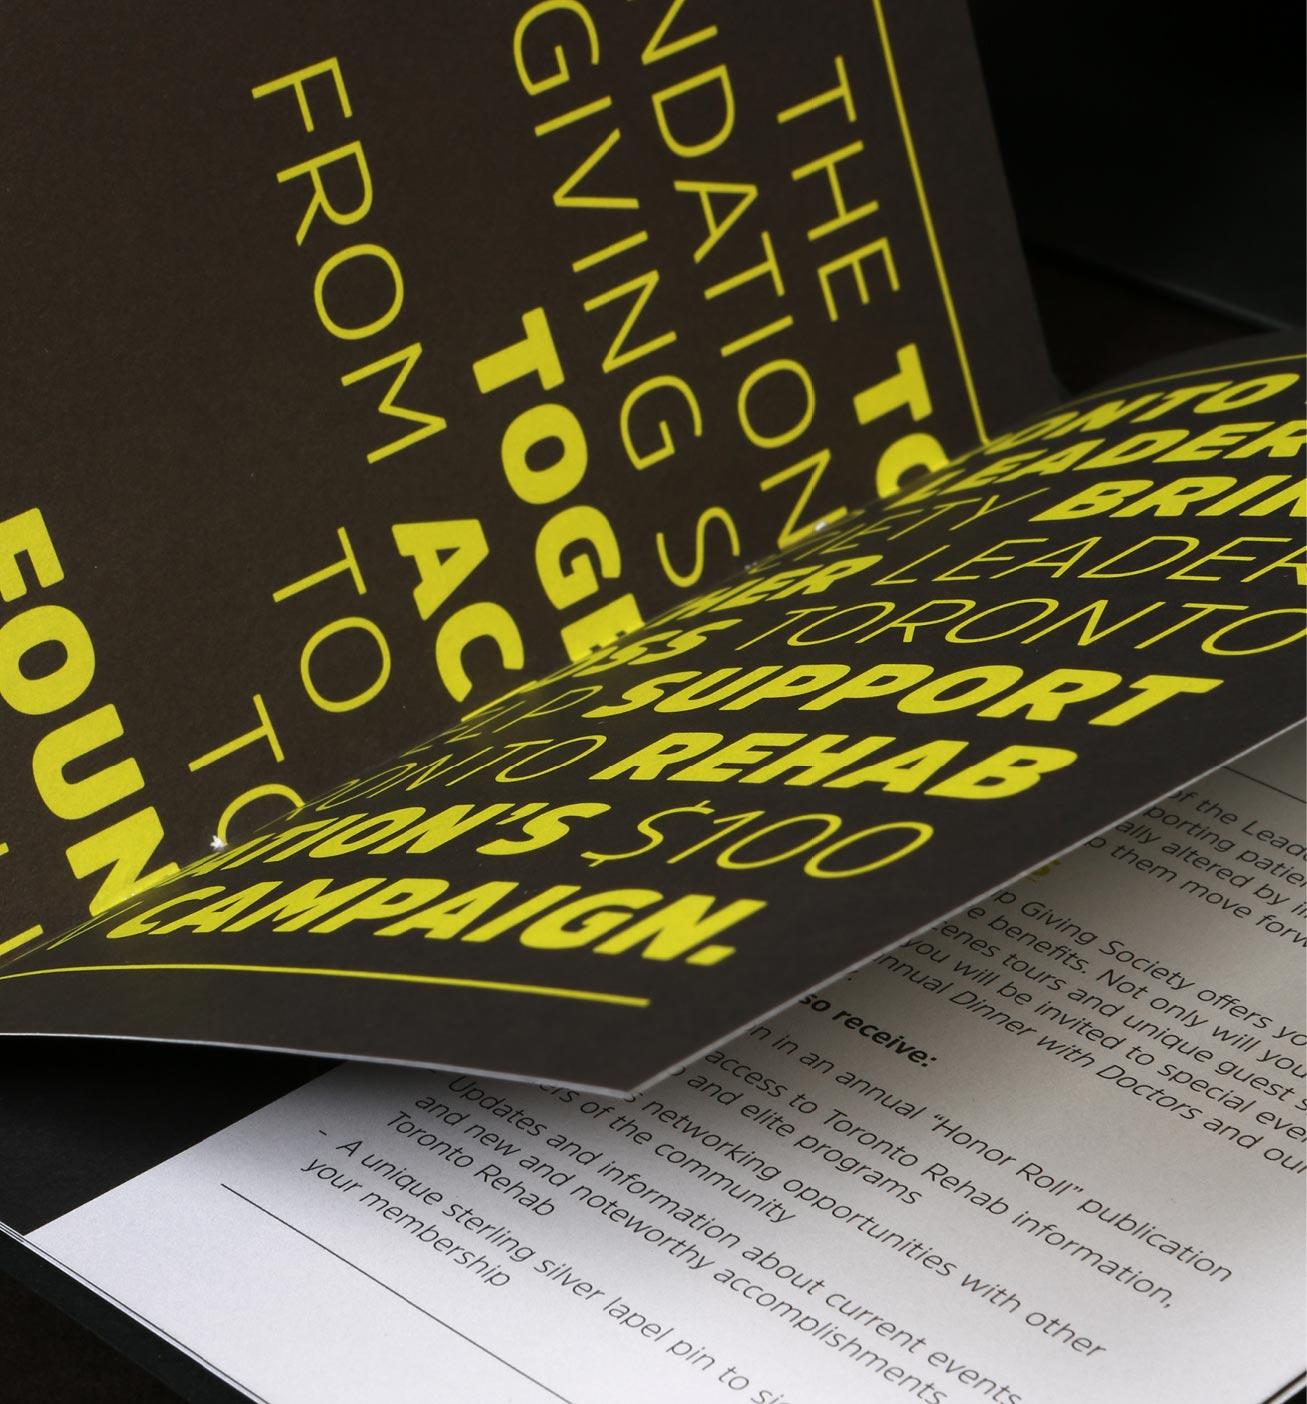 toronto-rehab-foundation-special-gifts-4-sputnik-design-partners.jpg